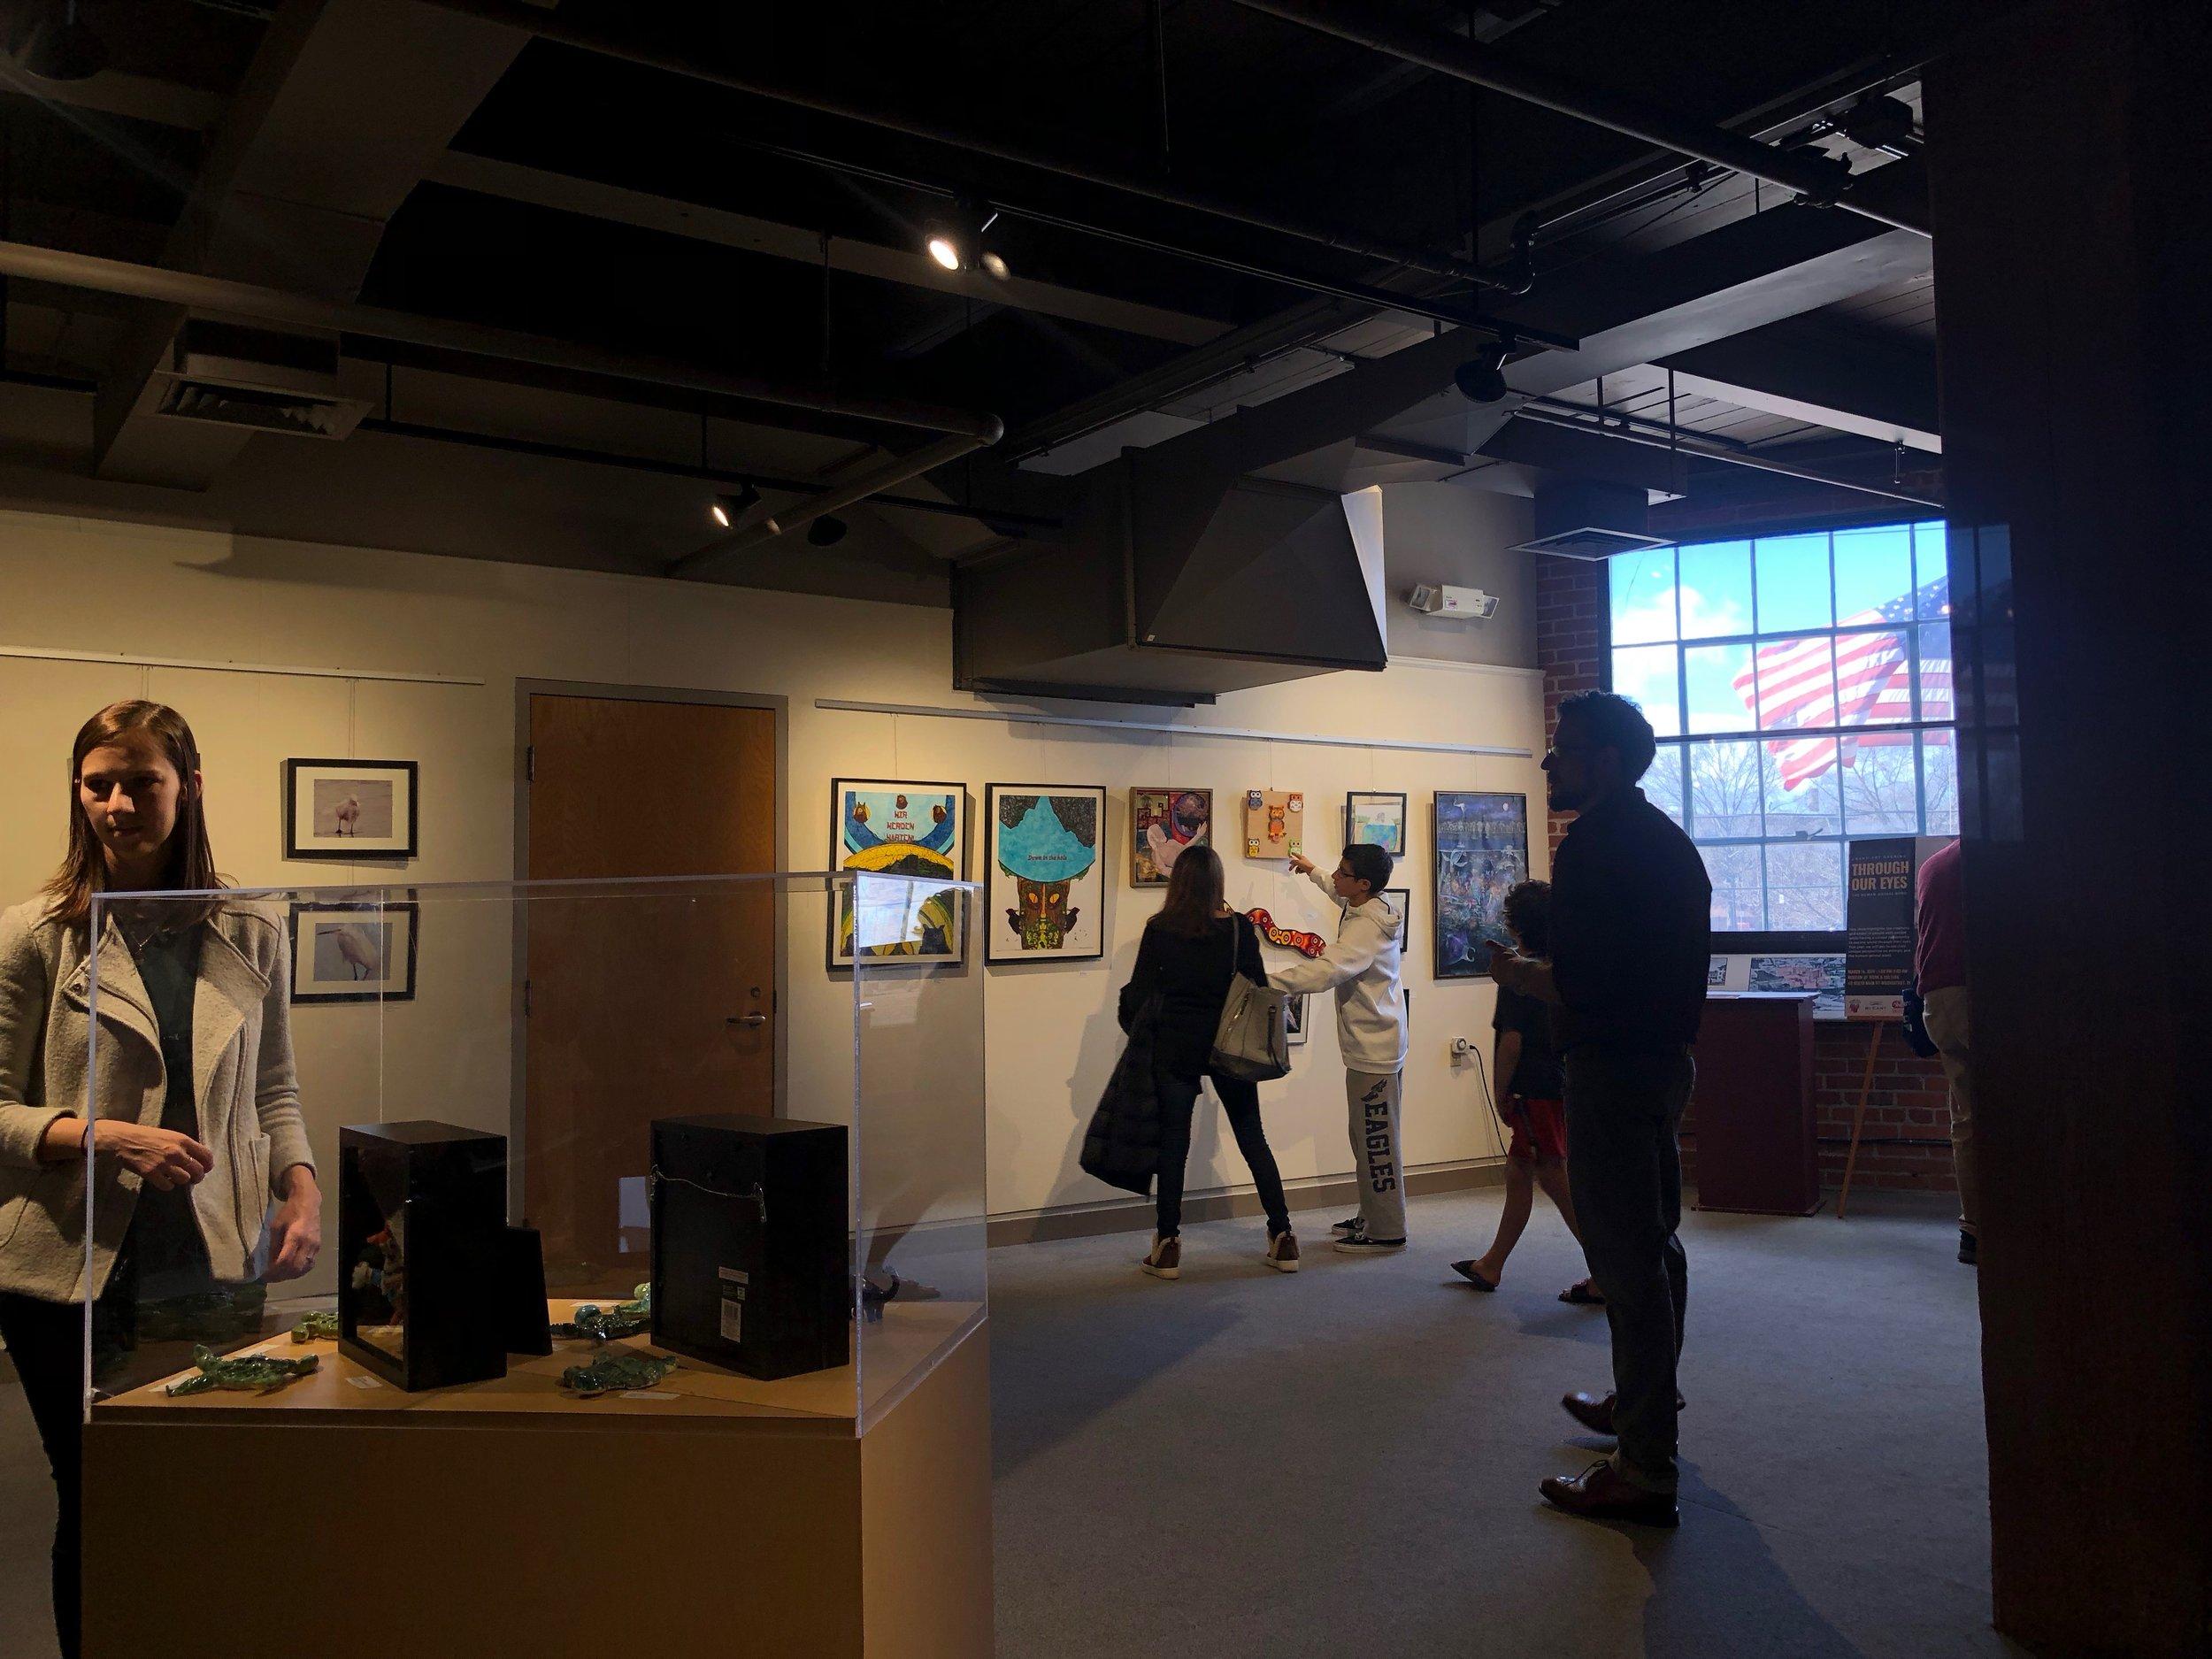 Interior Shot of Gallery